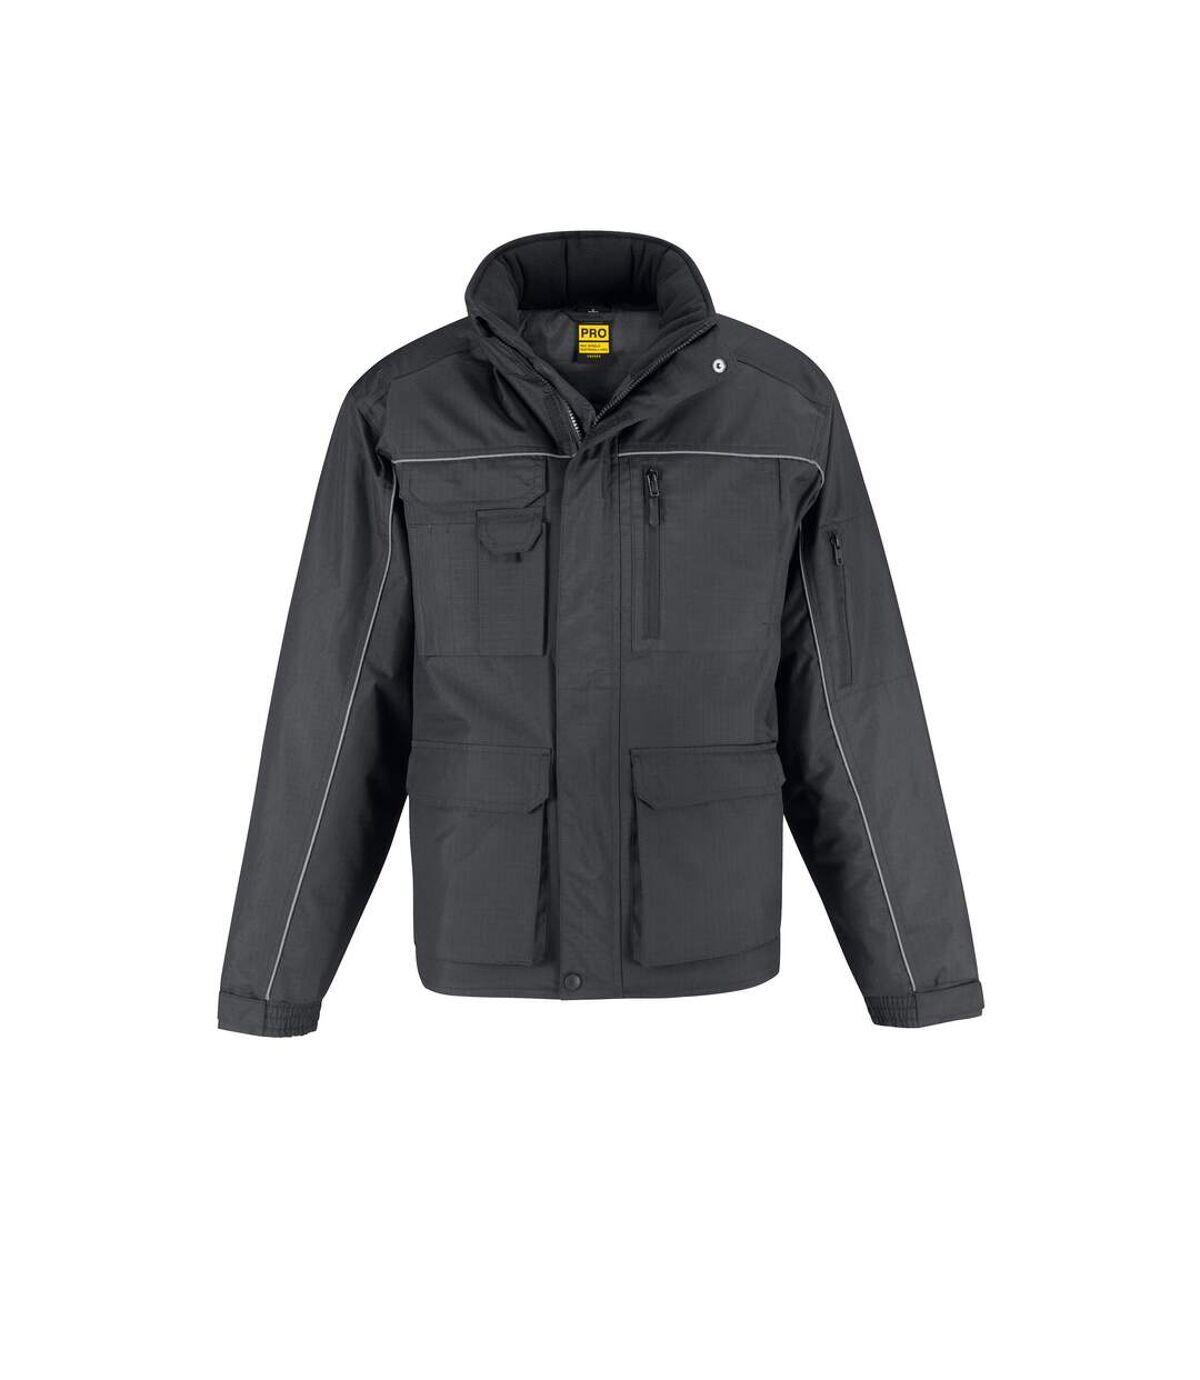 B&C Mens Shelter Pro Waterproof Jacket (Dark Grey) - UTRW4833